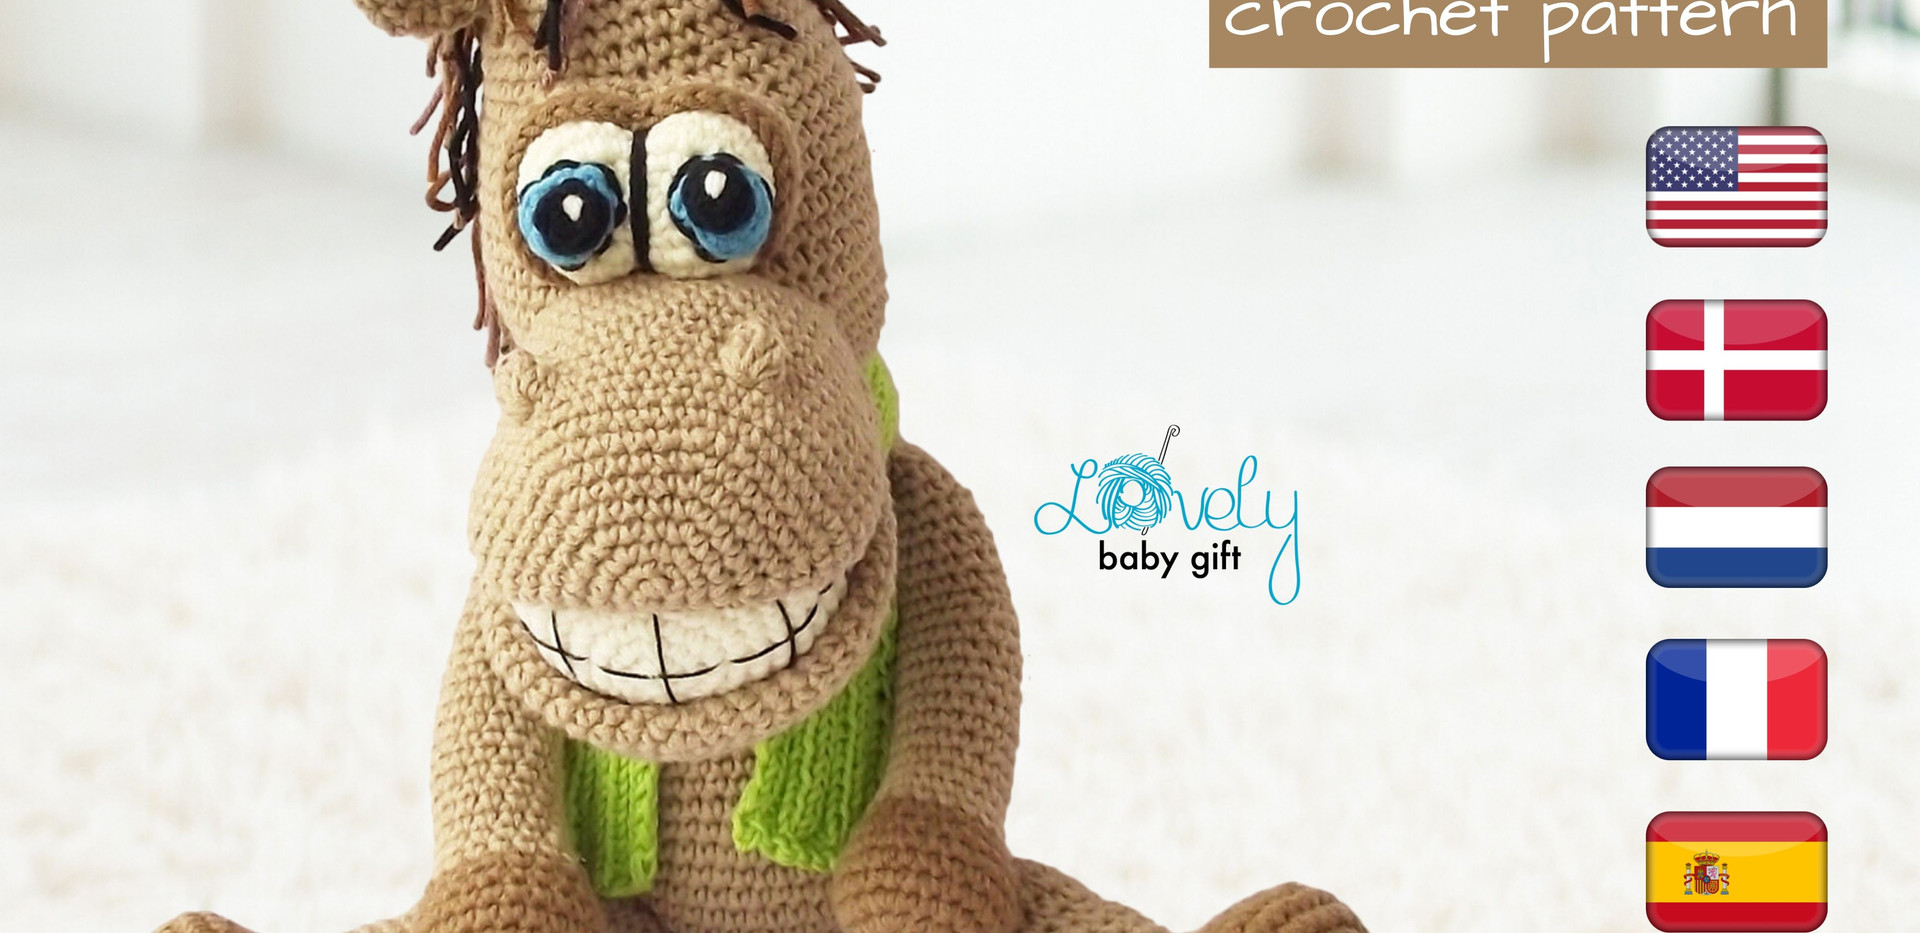 horse amigurumi crochet pattern.jpg